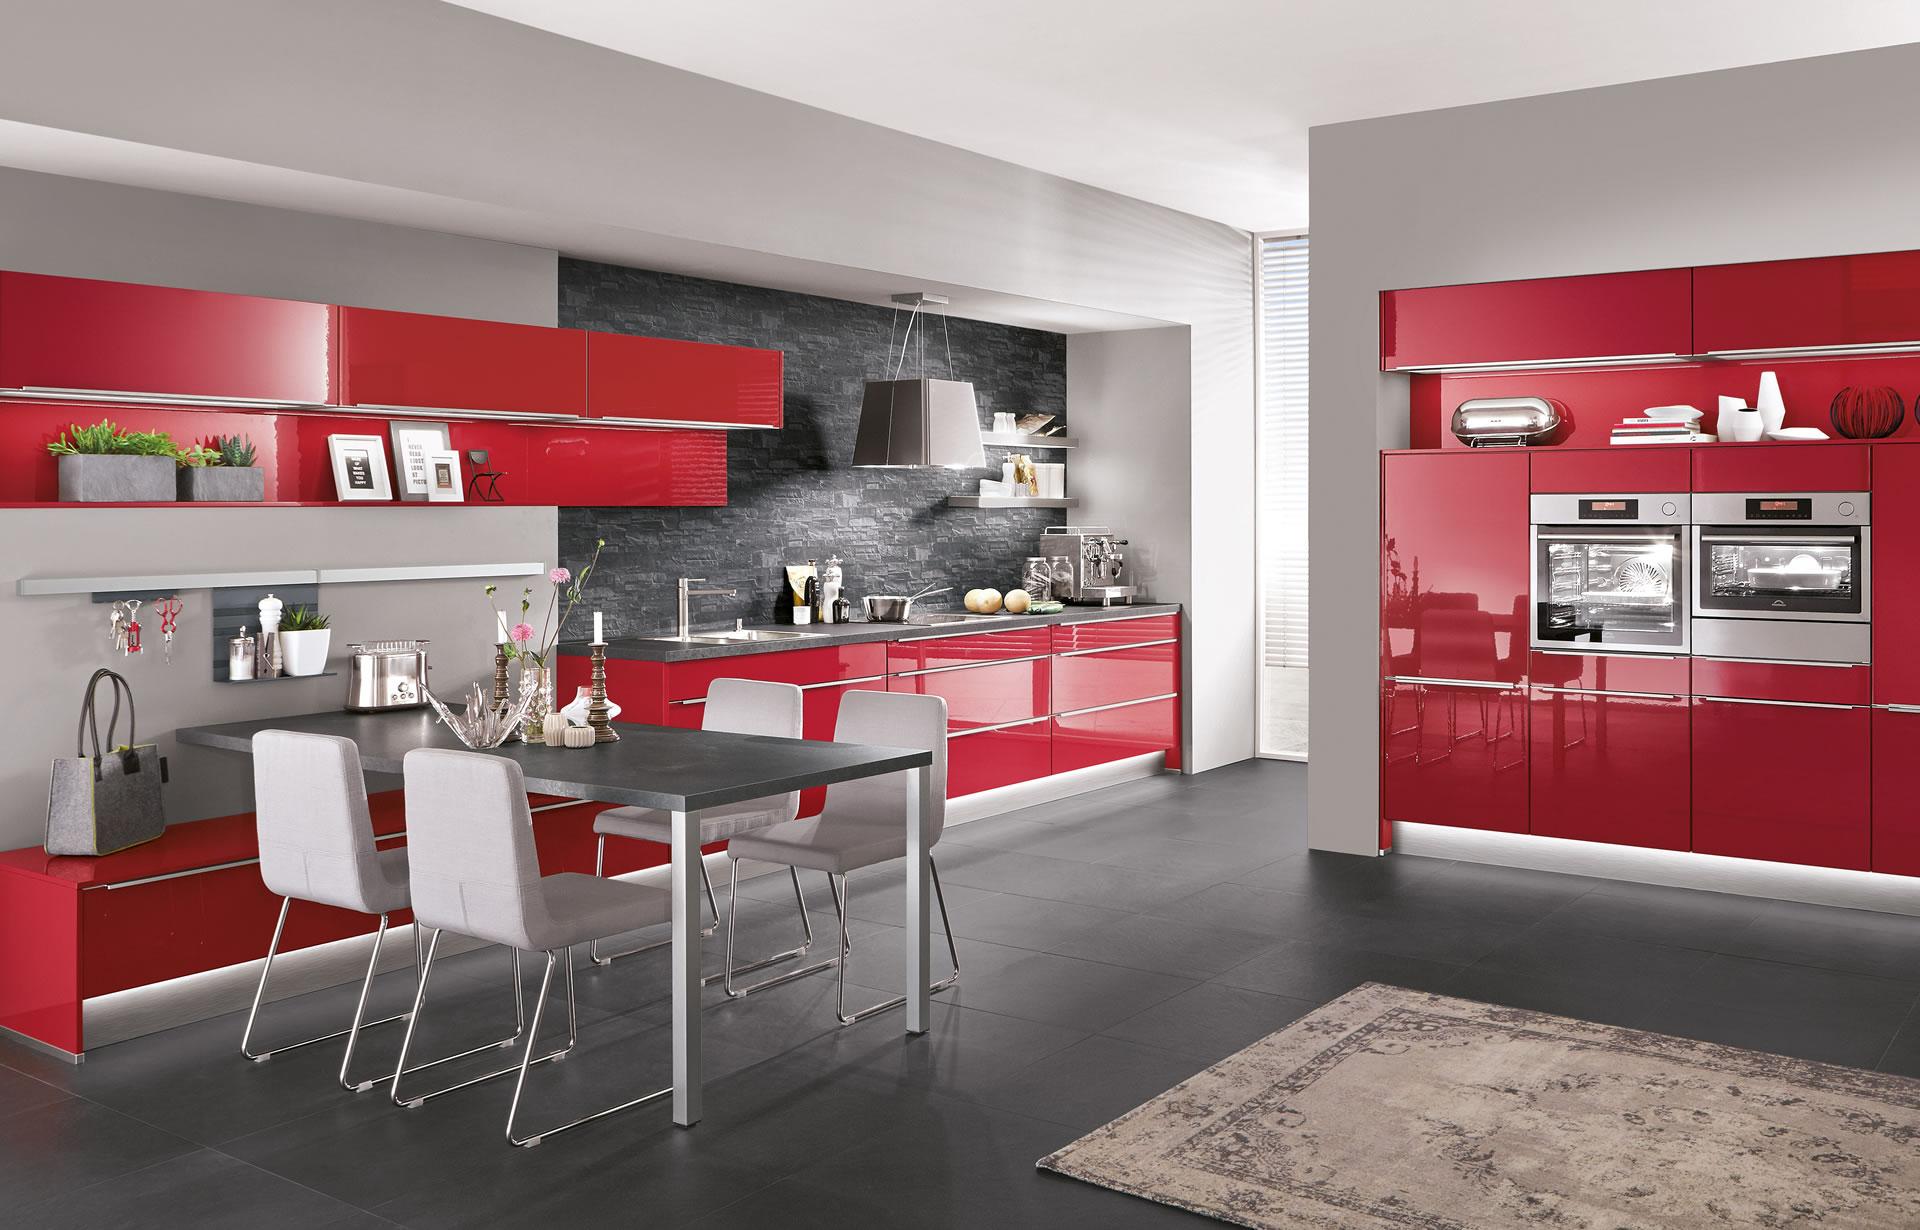 Emejing Nobilia Küchen Farben Photos - Milbank.us - milbank.us